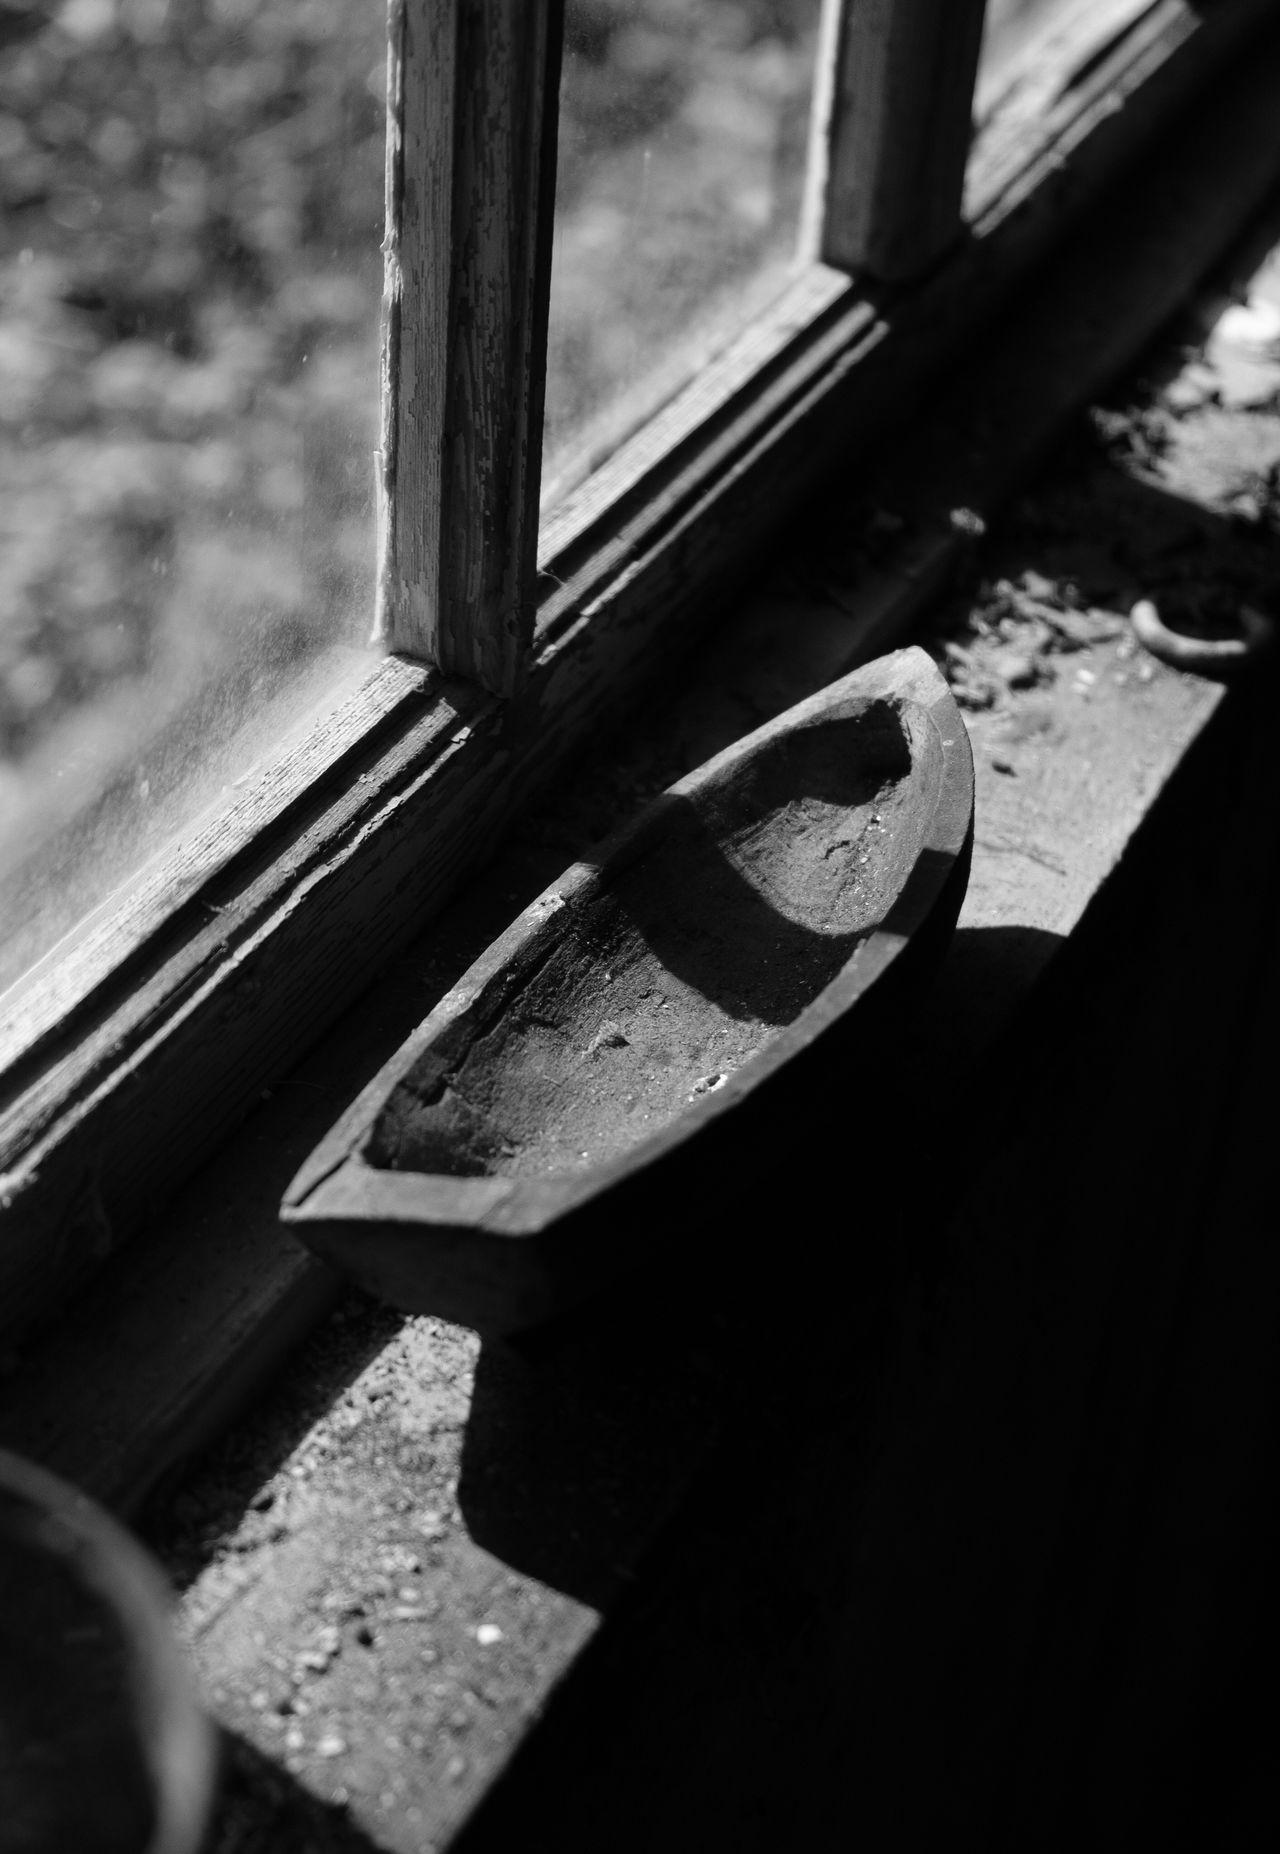 Taking Photos Wood Toy Old Shed Skjul Mirrolessrevolution Bat Leksak Fujifilm X-pro2 EyeEm Best Shots - Black + White Blackandwhite Photography Bnw Svartvitt Monochrome Xpro2 Sweden Vintage Fujifilm_xseries